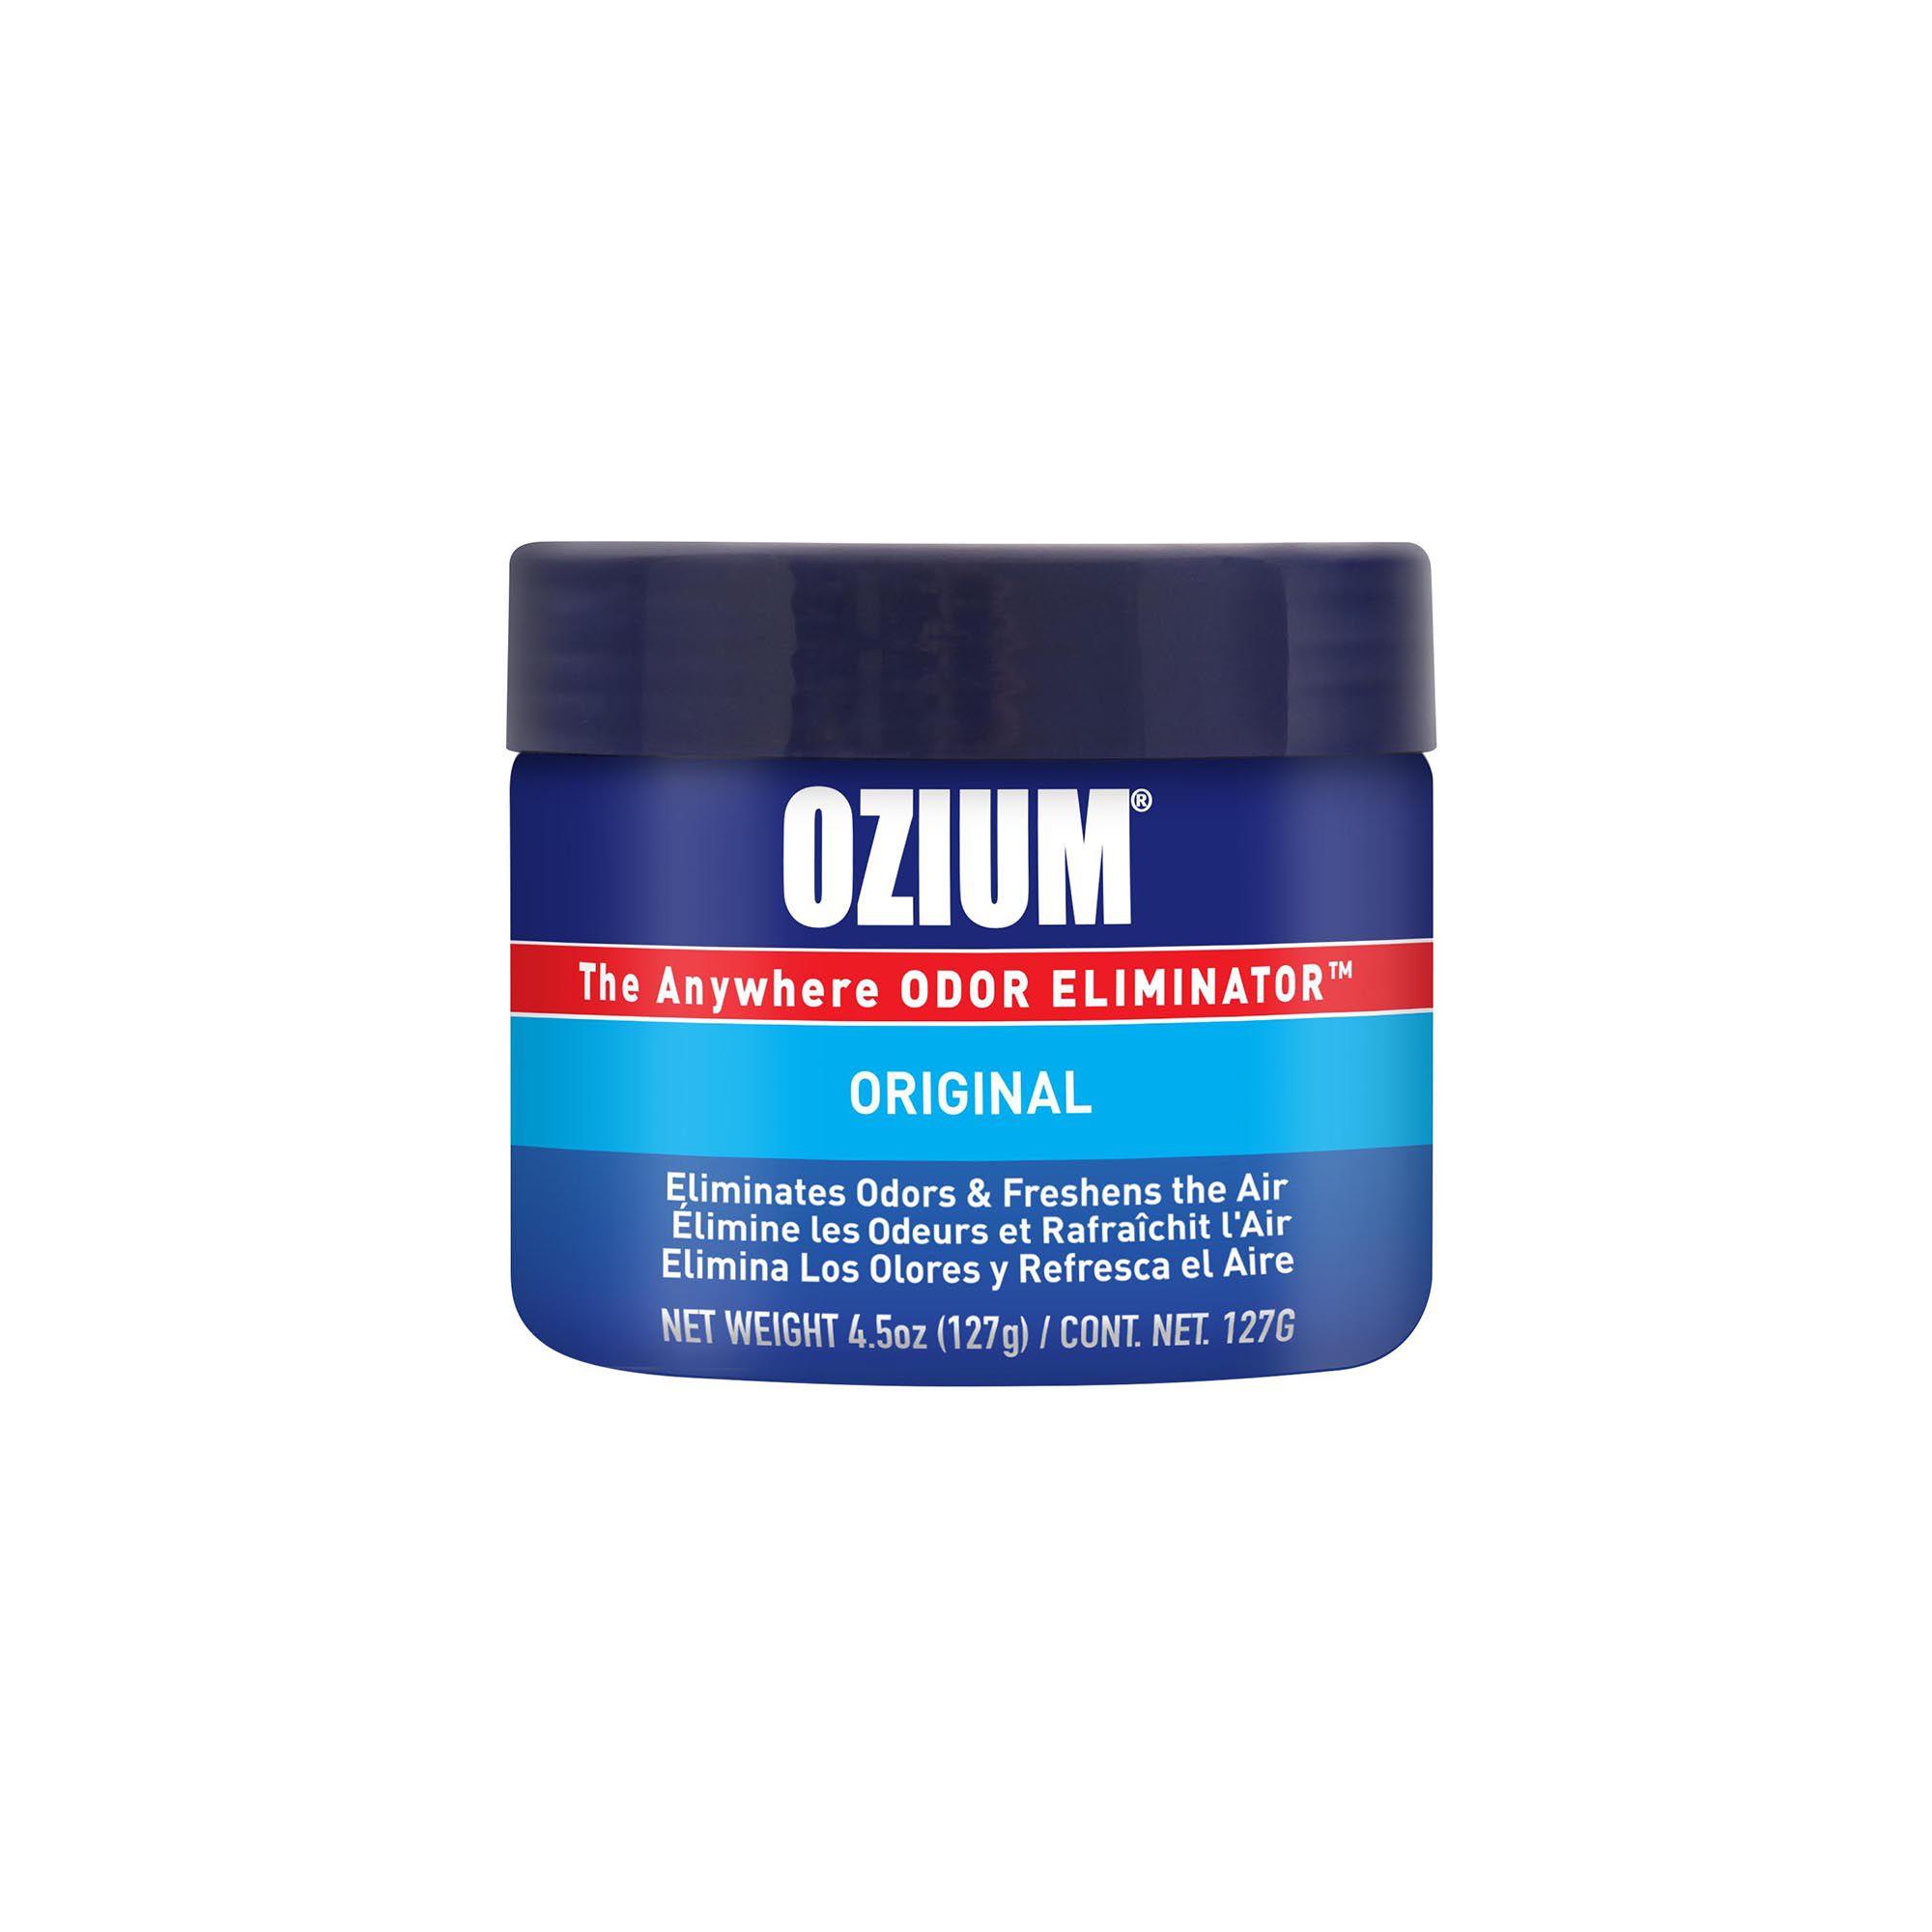 Ozium Anywhere Odor Eliminator